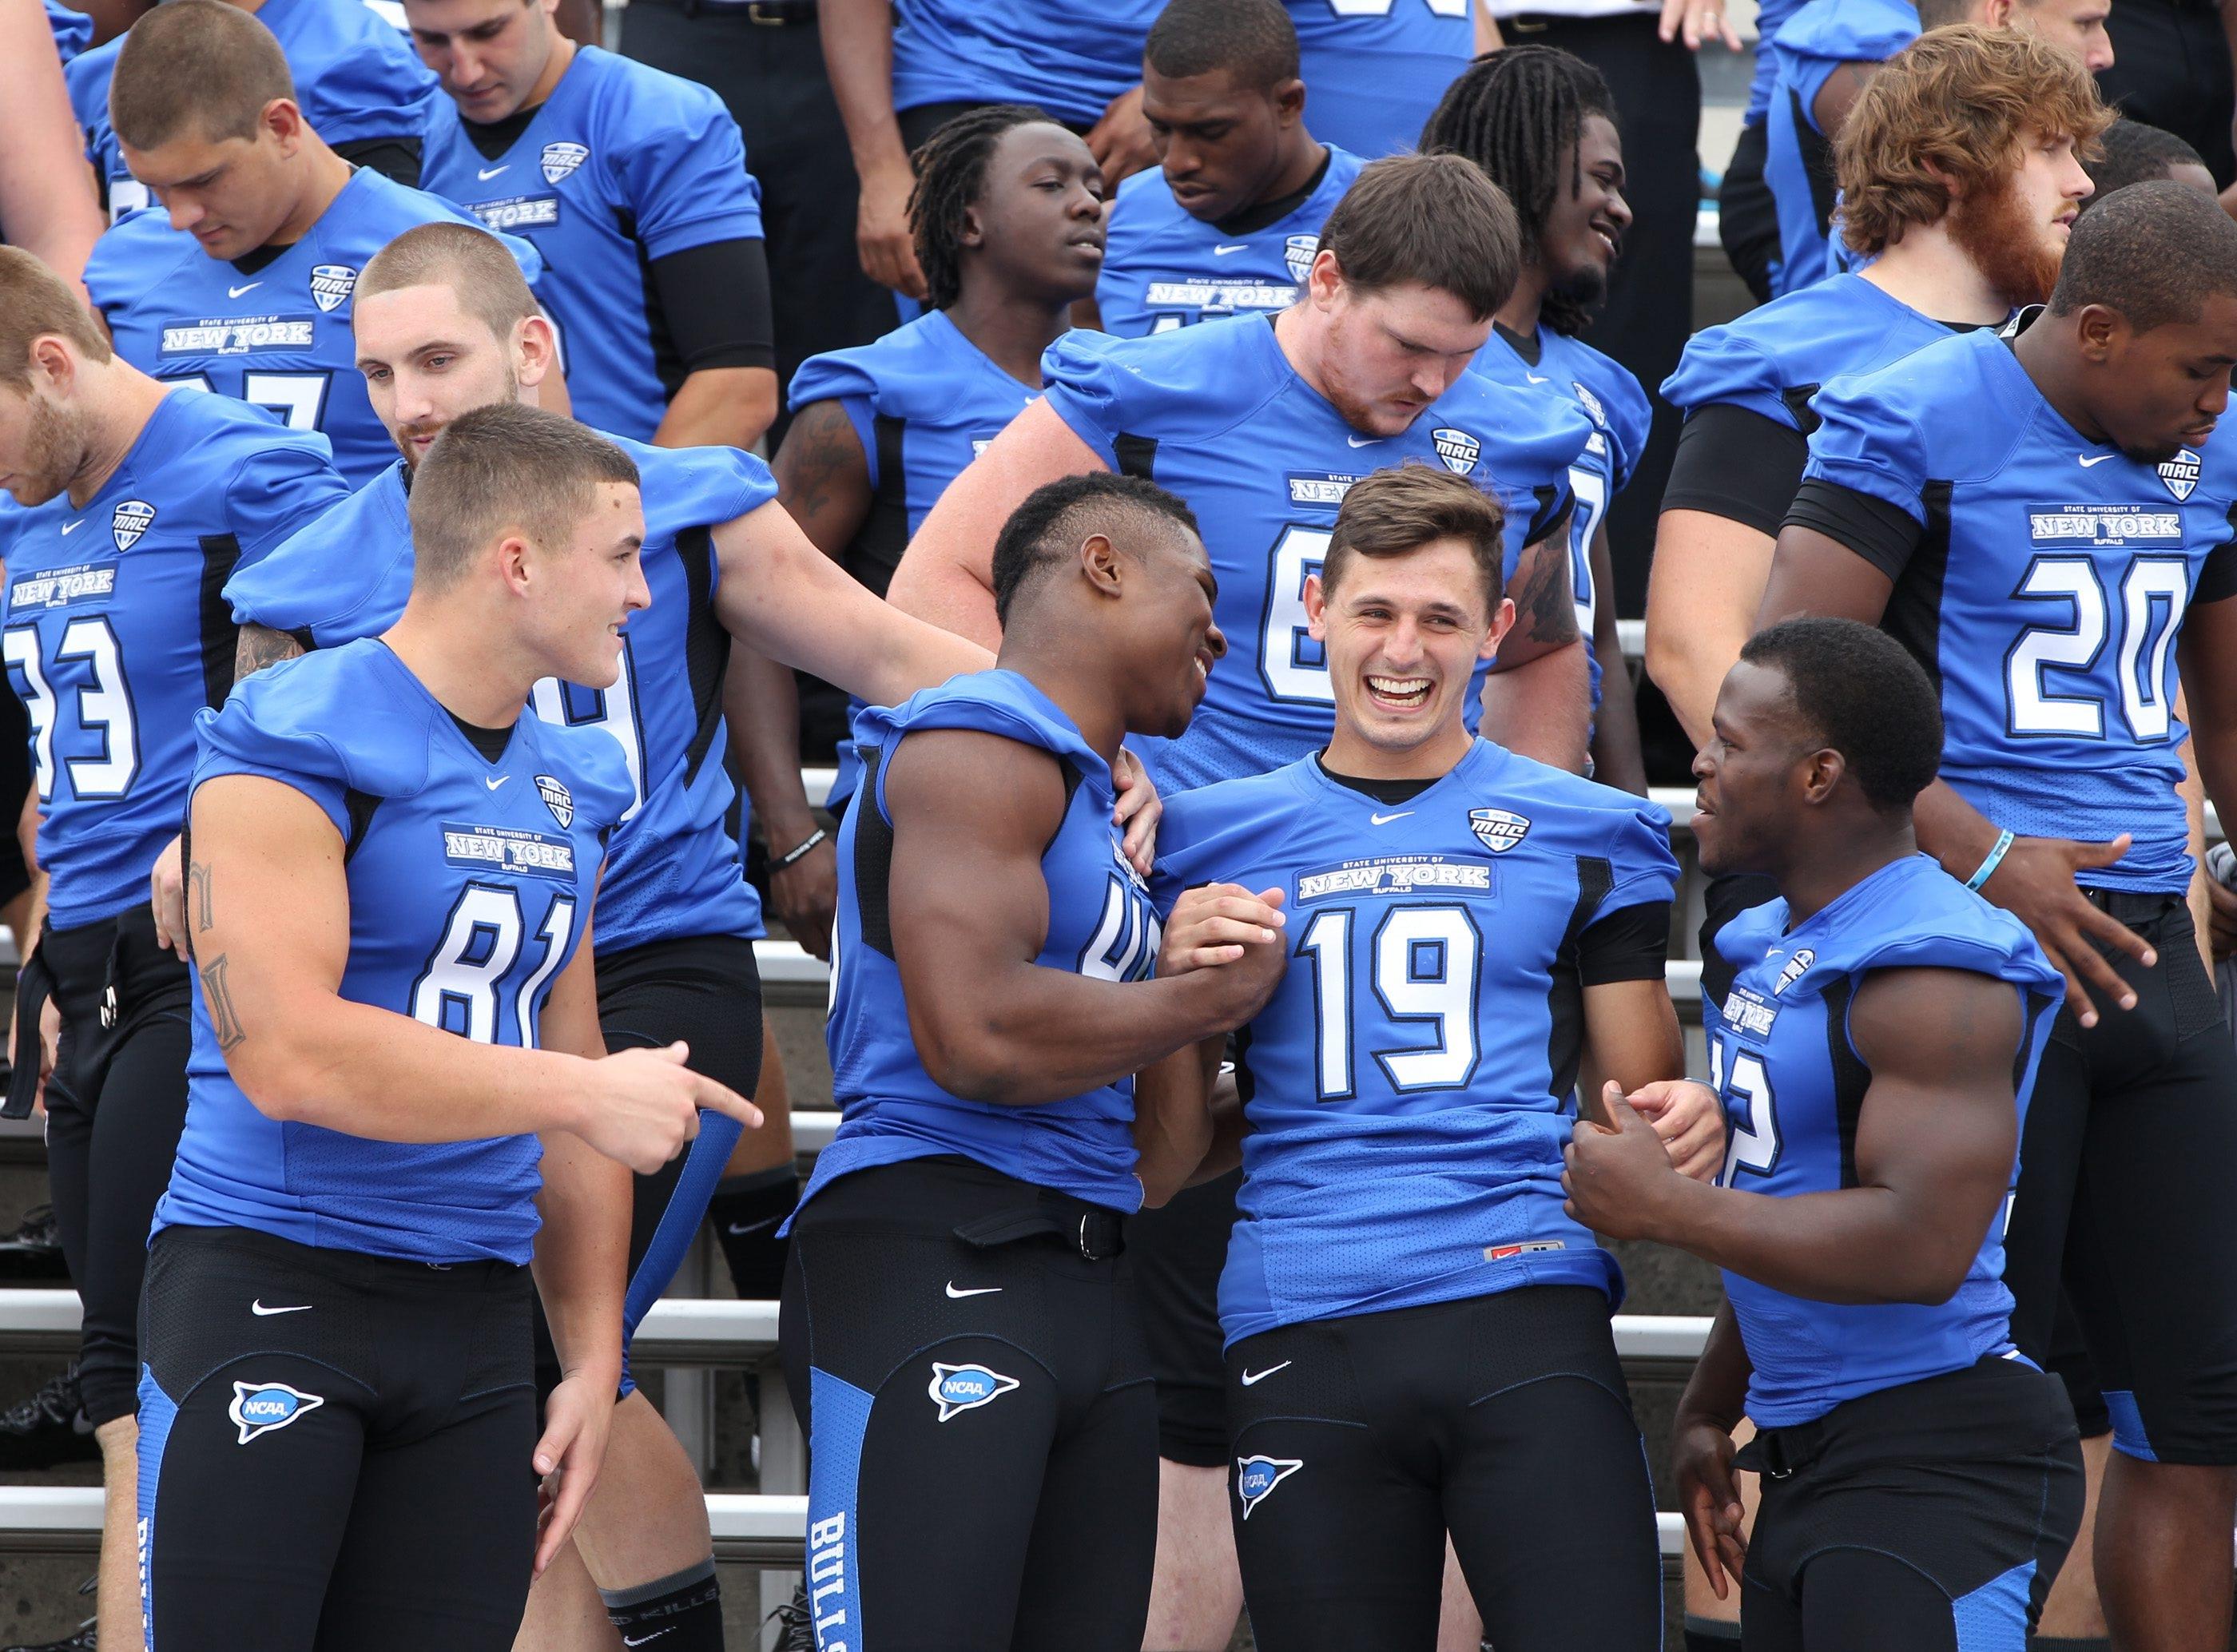 Khalil Mack (46) clowns around with Alex Neutz (19)  and Jimmy Gordon during media day festivities at University at Buffalo Stadium.